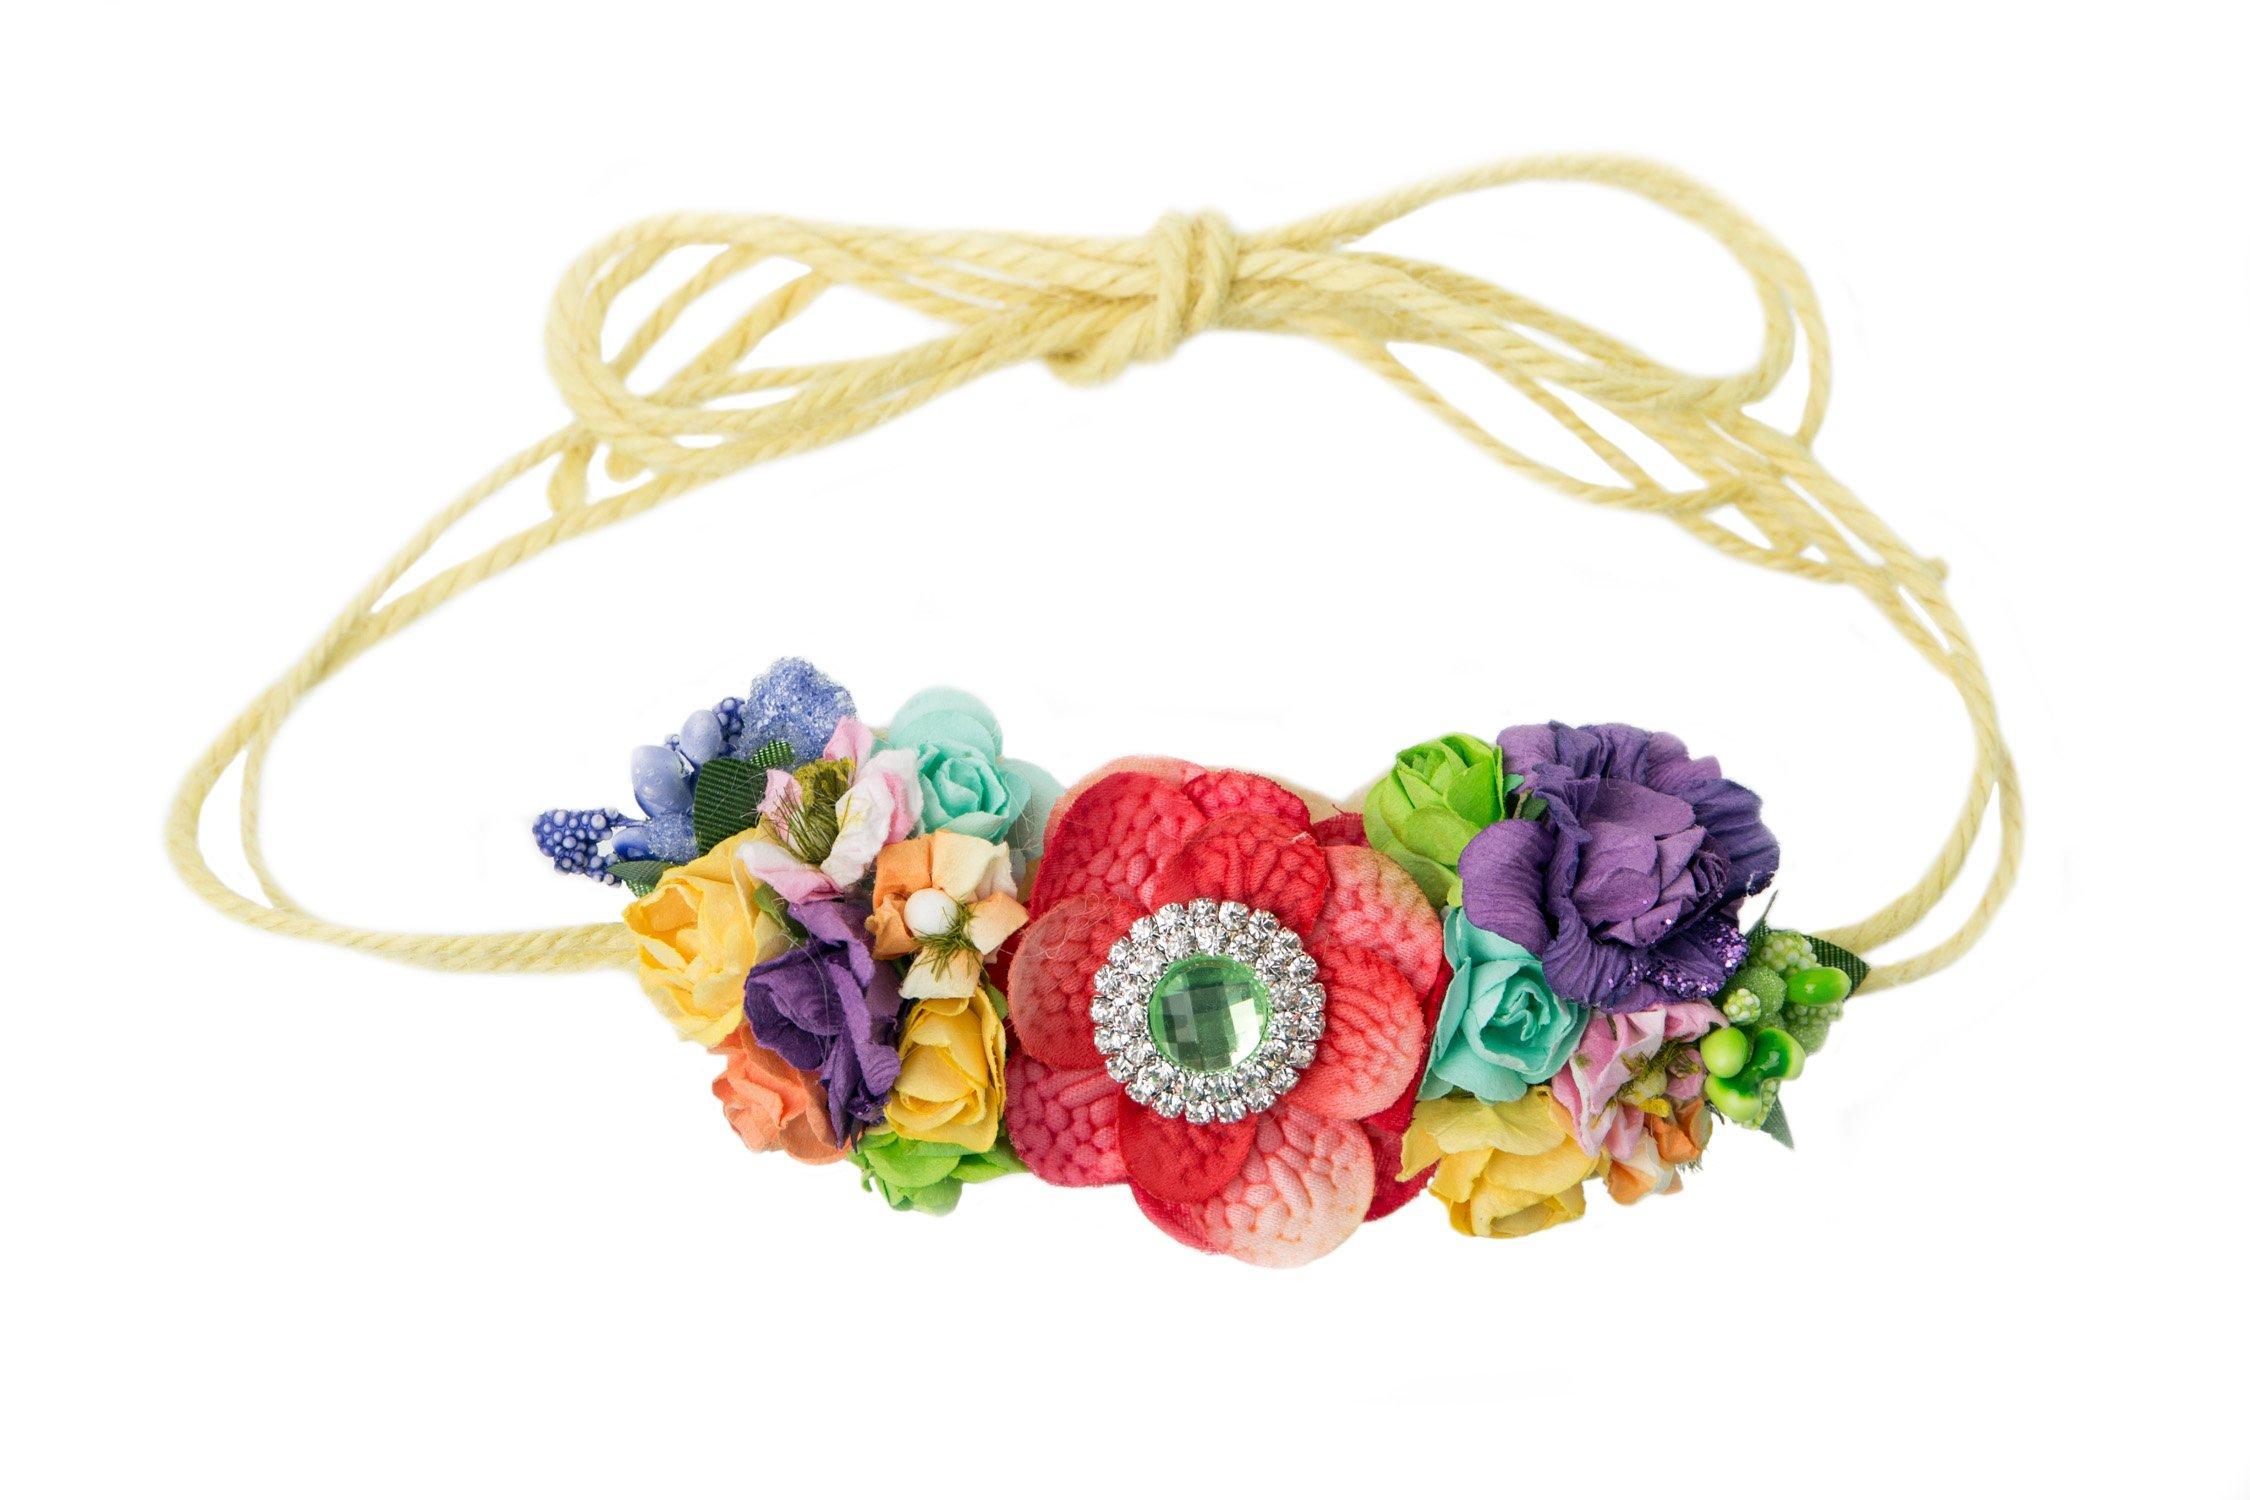 Mini Floral Headband Bohemian Style Formal Head Wear Garland One Size Fits All - Rhinestone Rainbow - 4 x 2 Inches